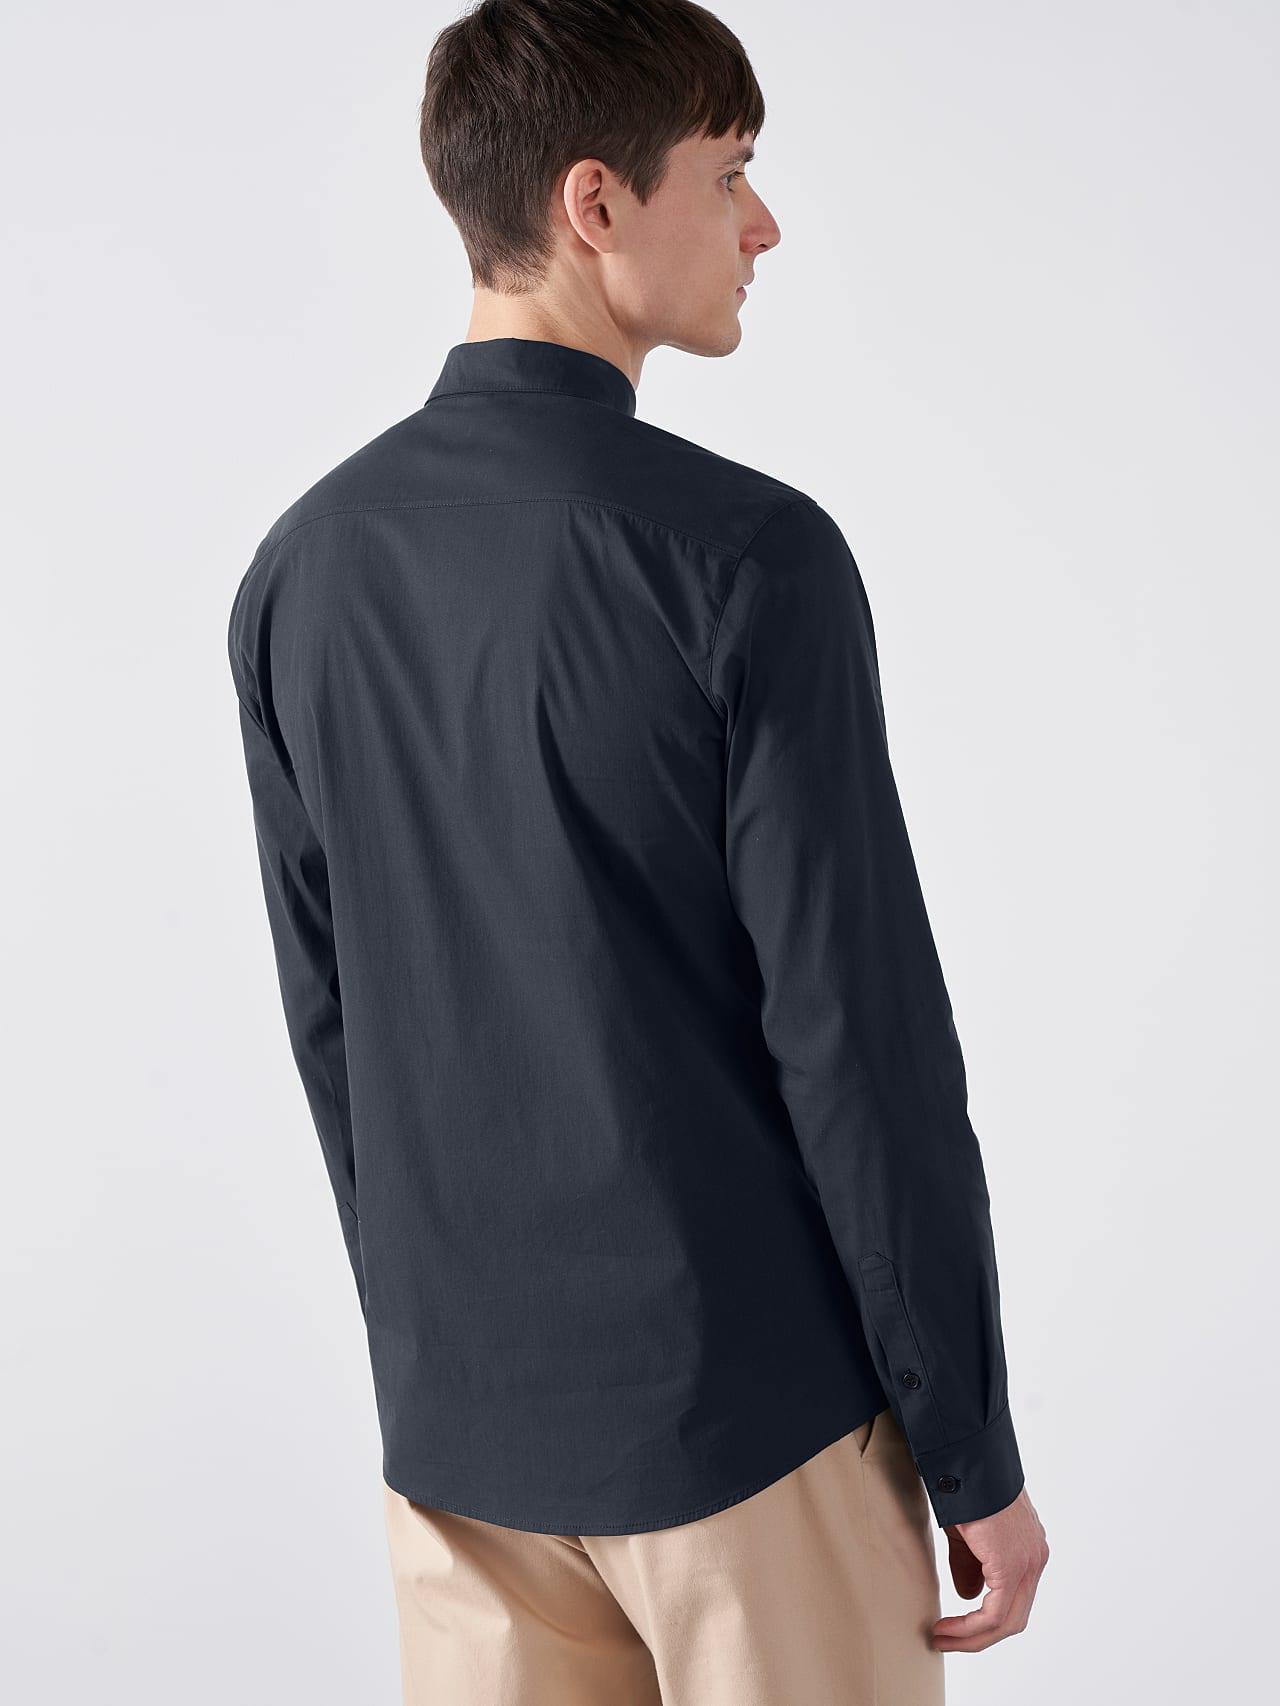 WAARG V1.Y5.01 Cotton-Stretch Shirt navy Front Main Alpha Tauri